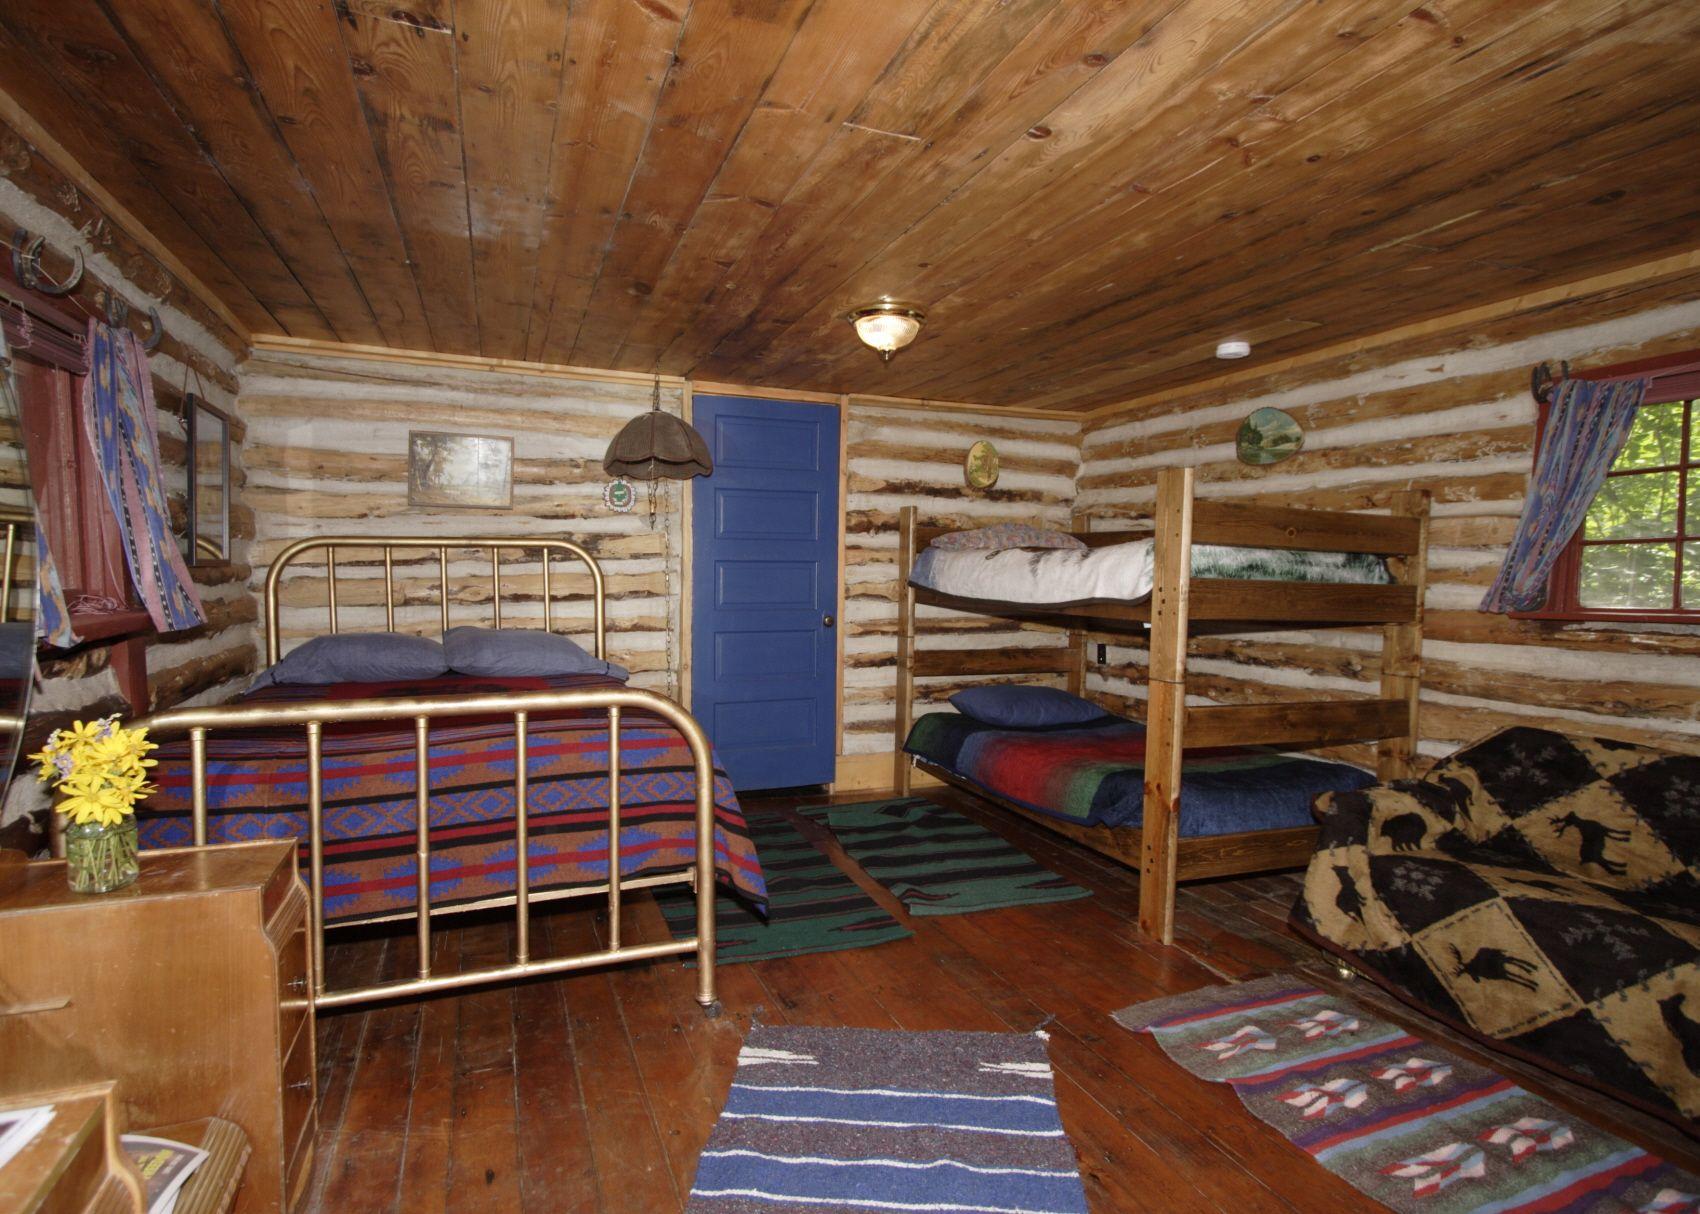 Rustic Interiors Rustic Cabin Interior Cabin Inspirations Rustic Pinterest Cabin